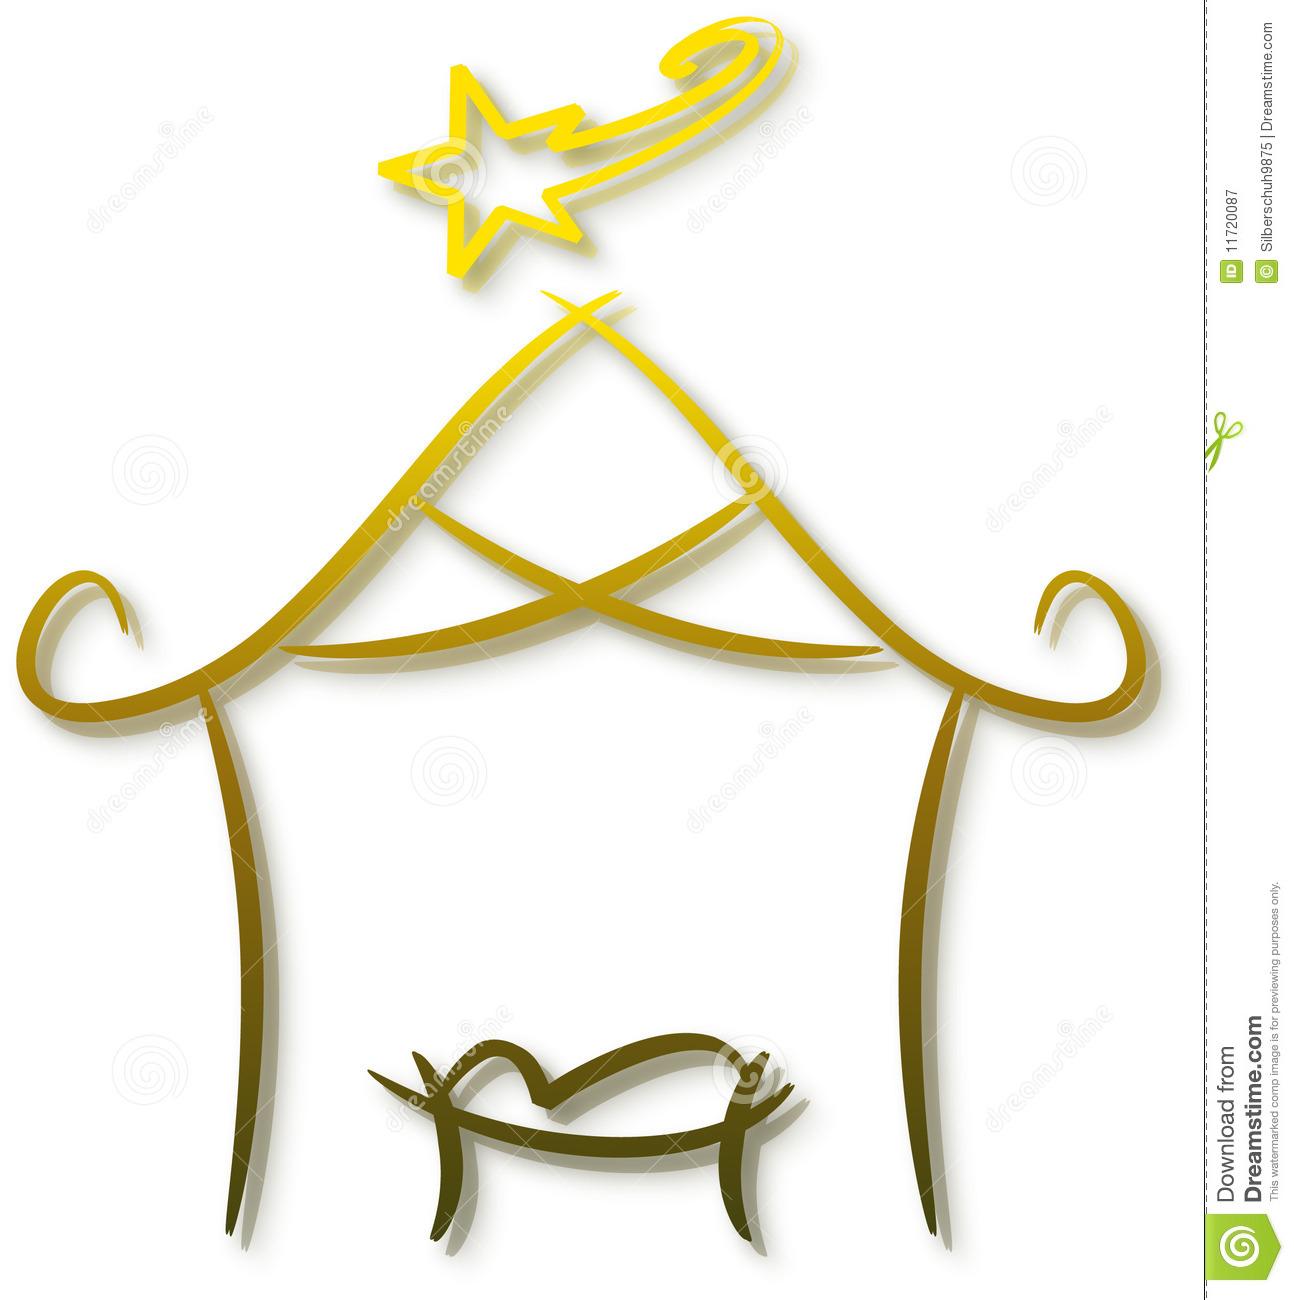 star of bethlehem drawing at getdrawings com free for personal use rh getdrawings com North Star of Bethlehem Clip Art Bethlehem Star Outline Clip Art